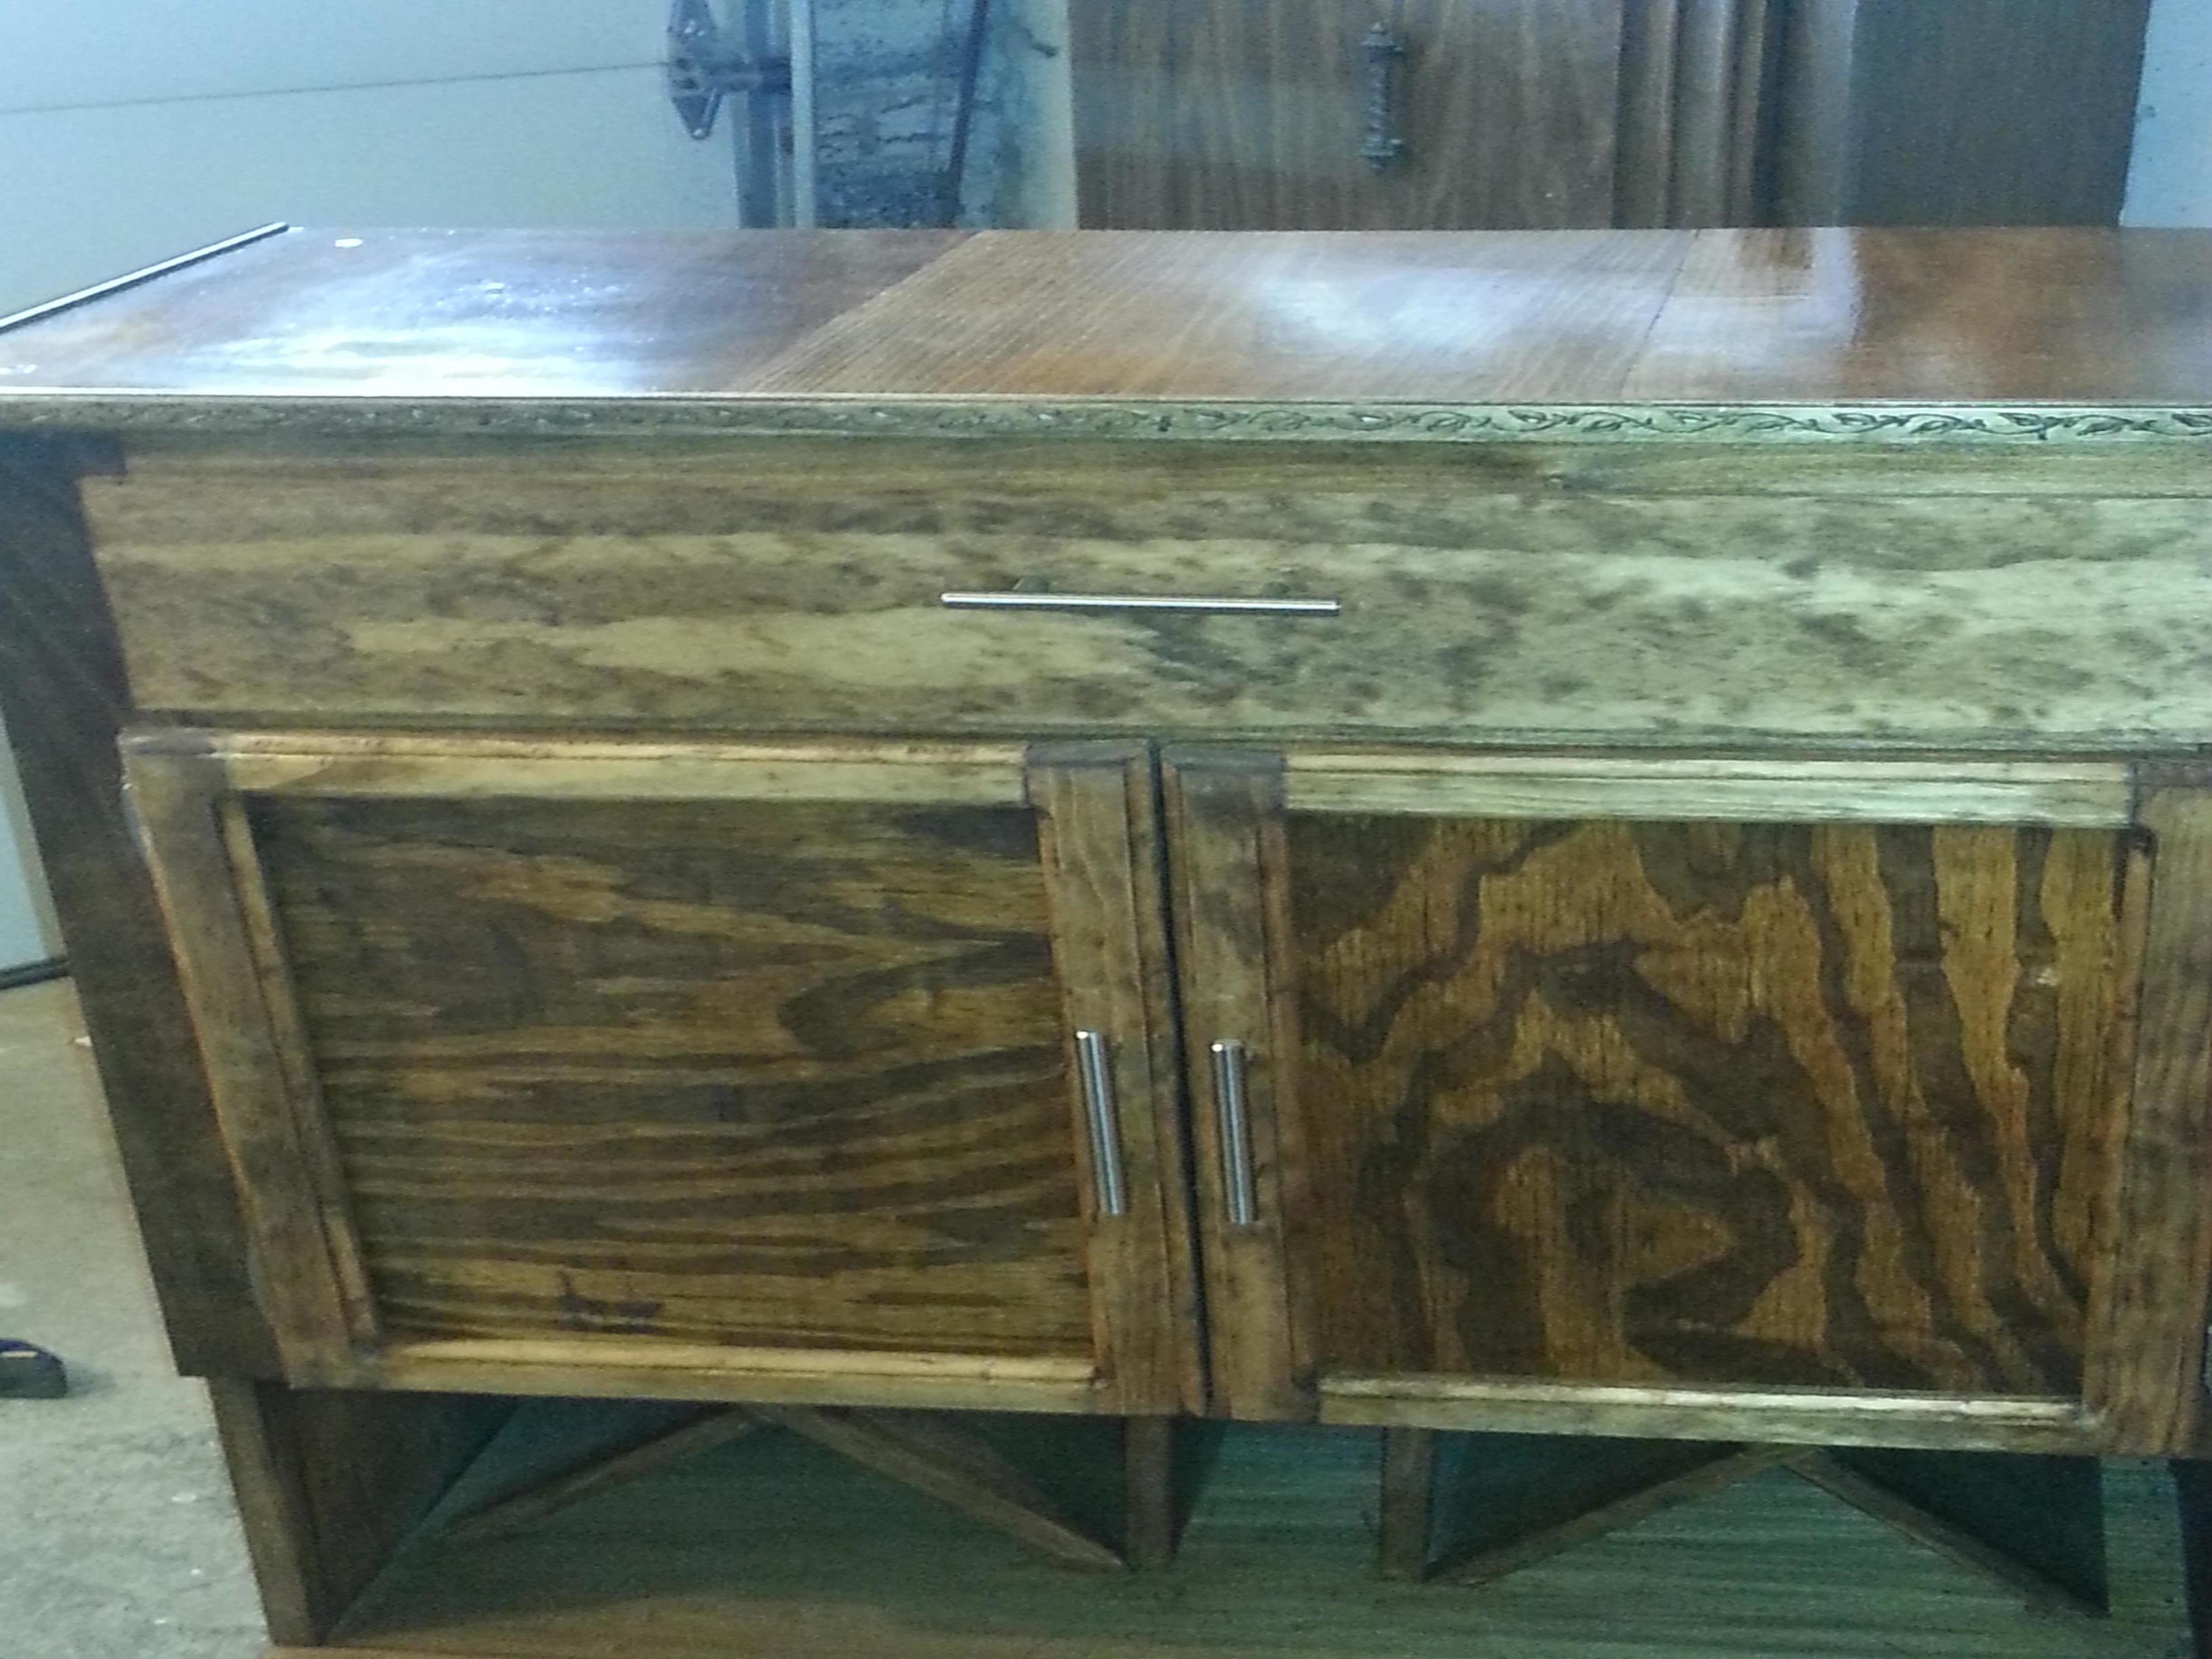 Litton woodworking in philadelphia lumber wood for Furniture r us philadelphia